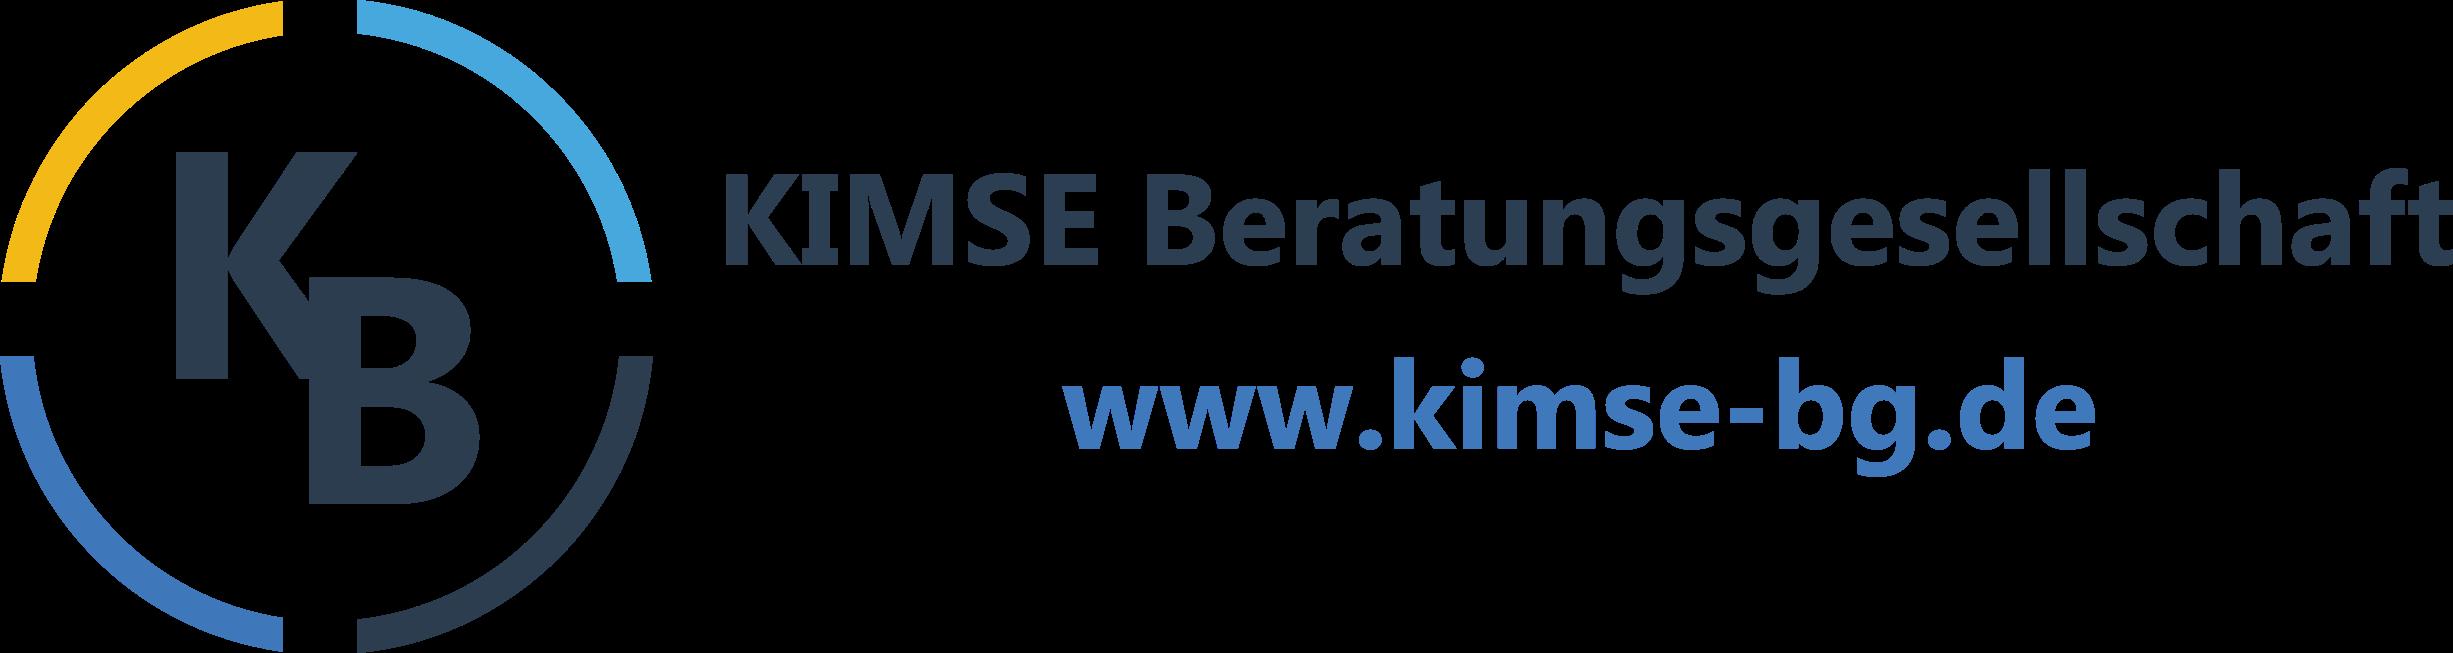 KIMSE Beratungsgesellschaft UG (hb)